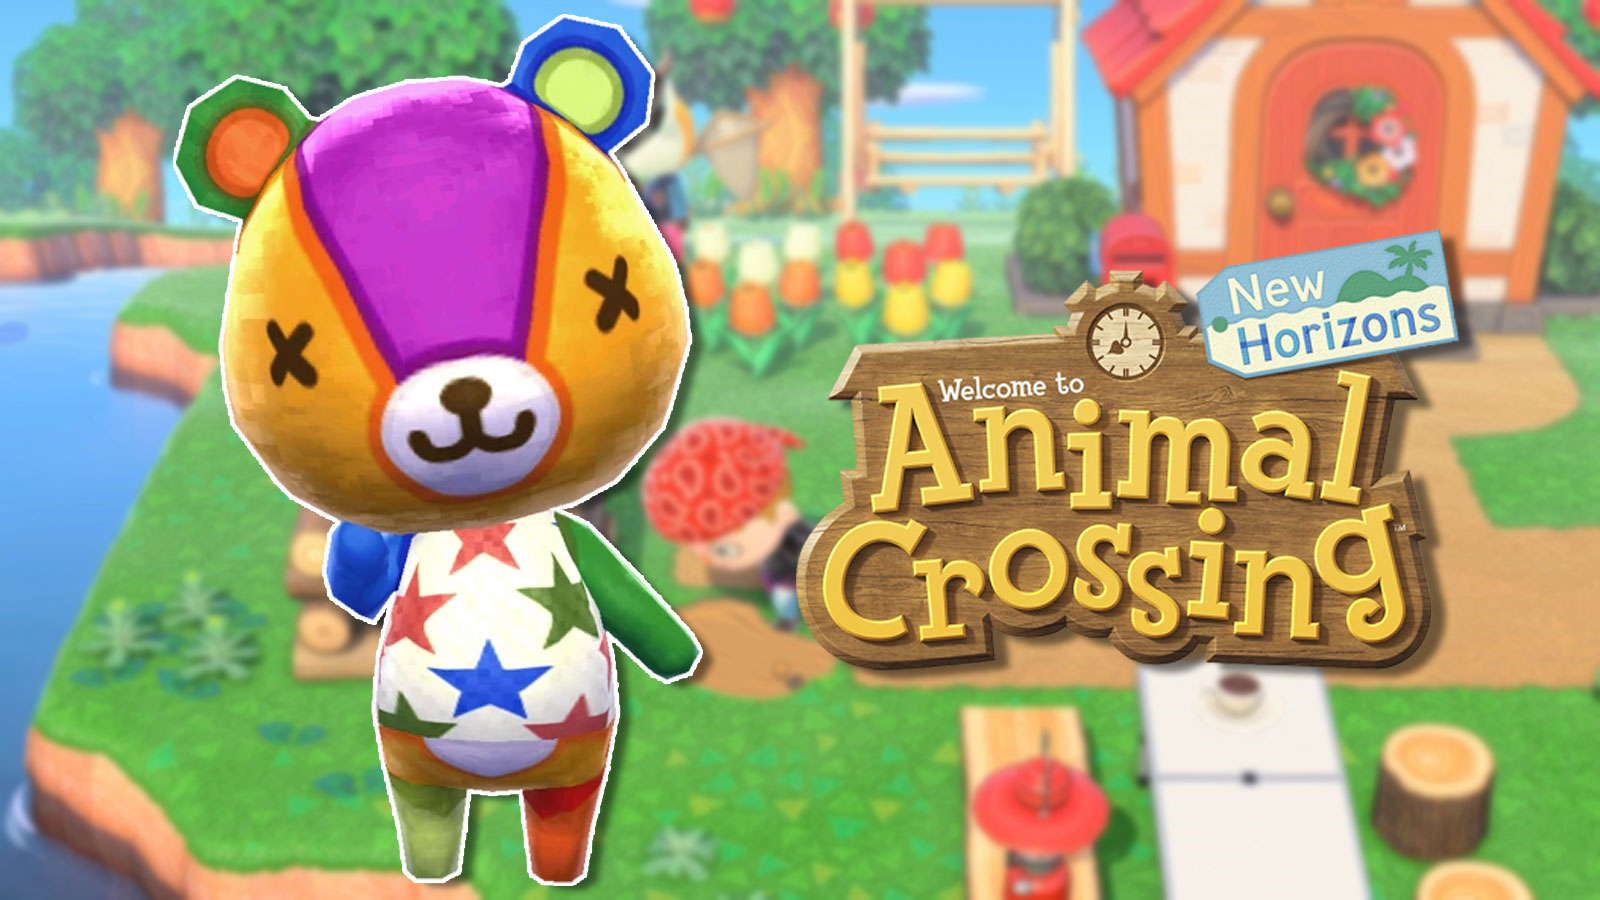 Animal Crossing New Horizons Stitches